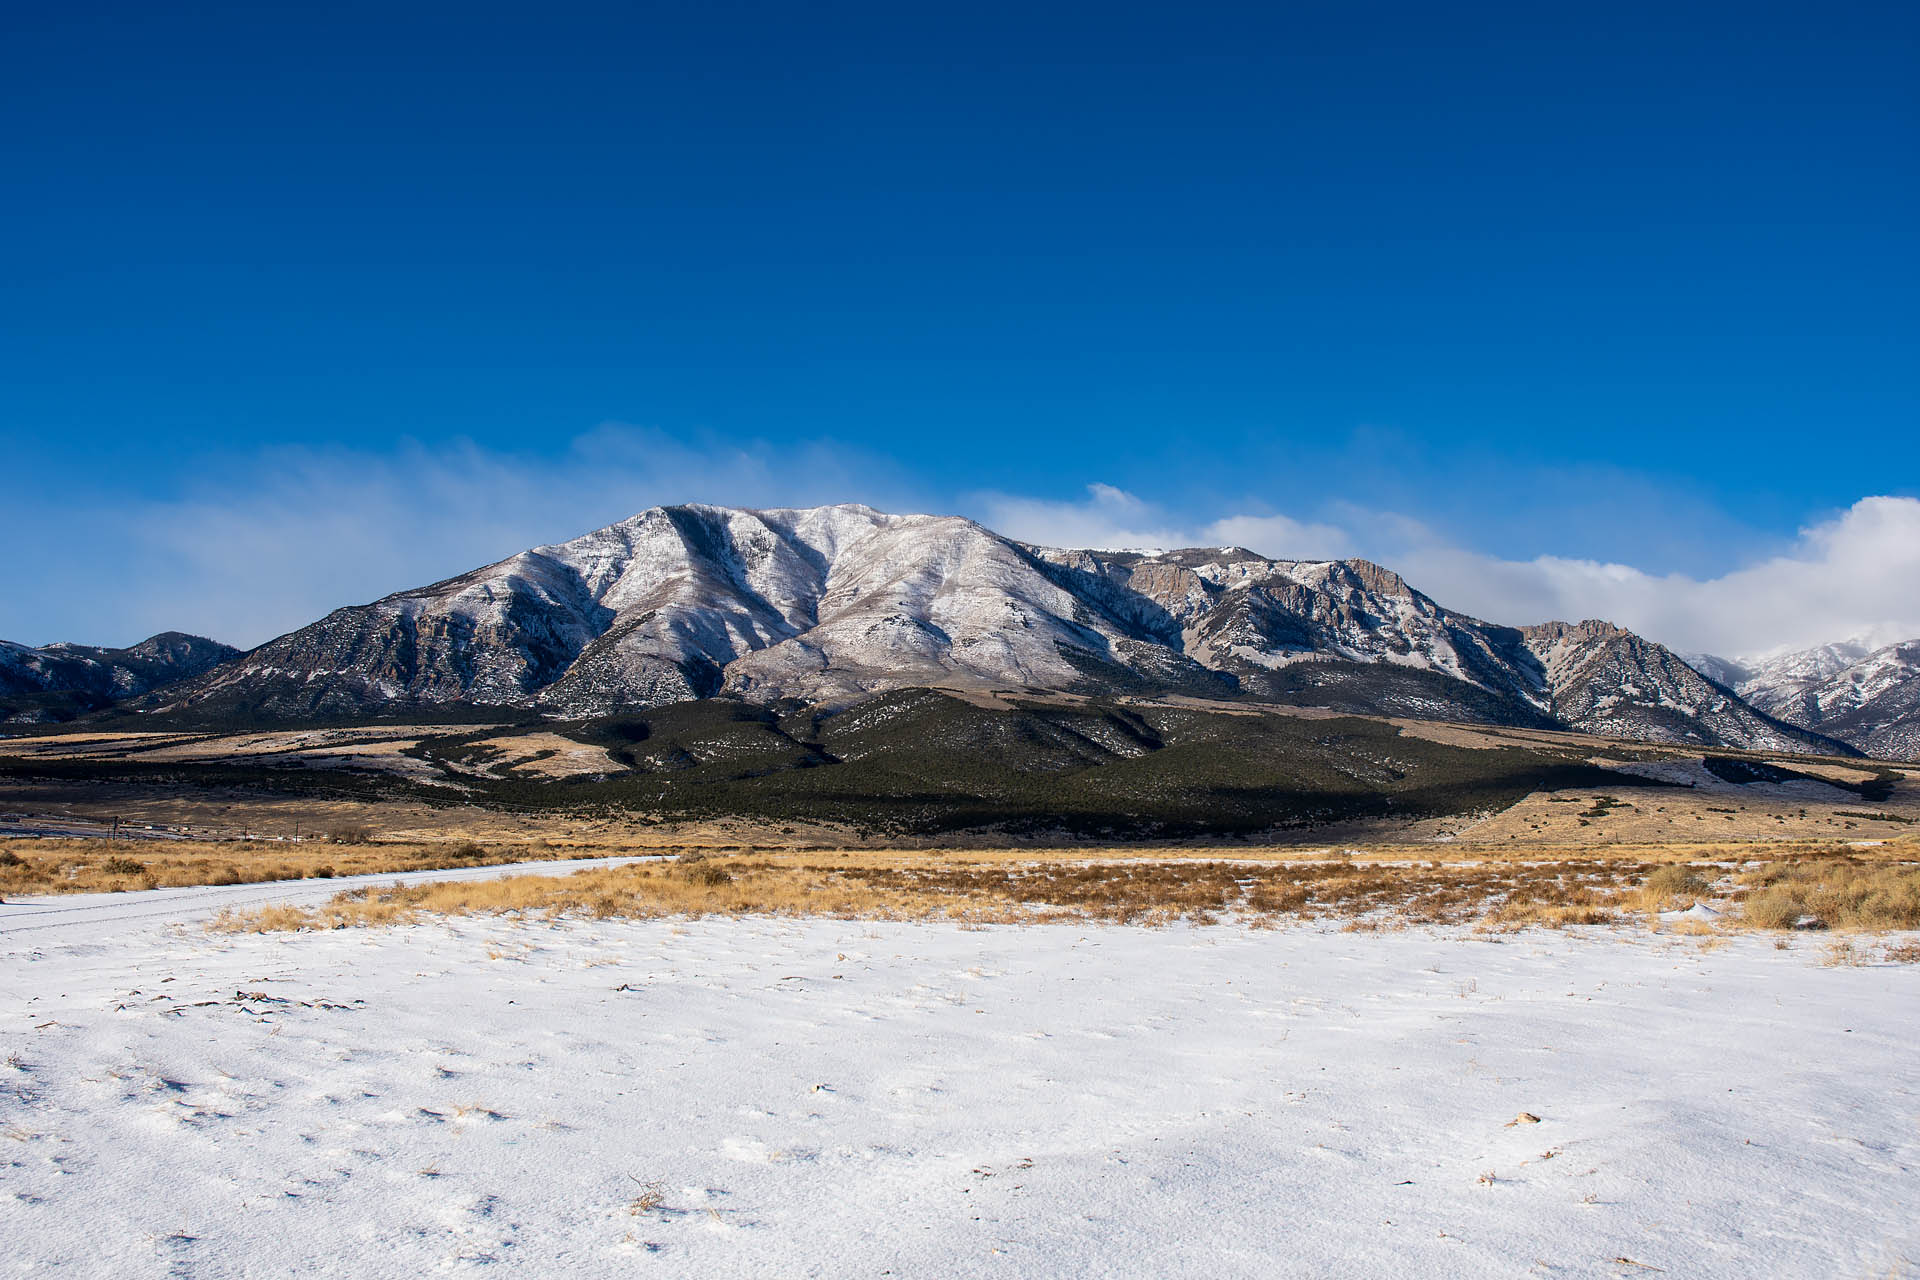 Mt. Brigham